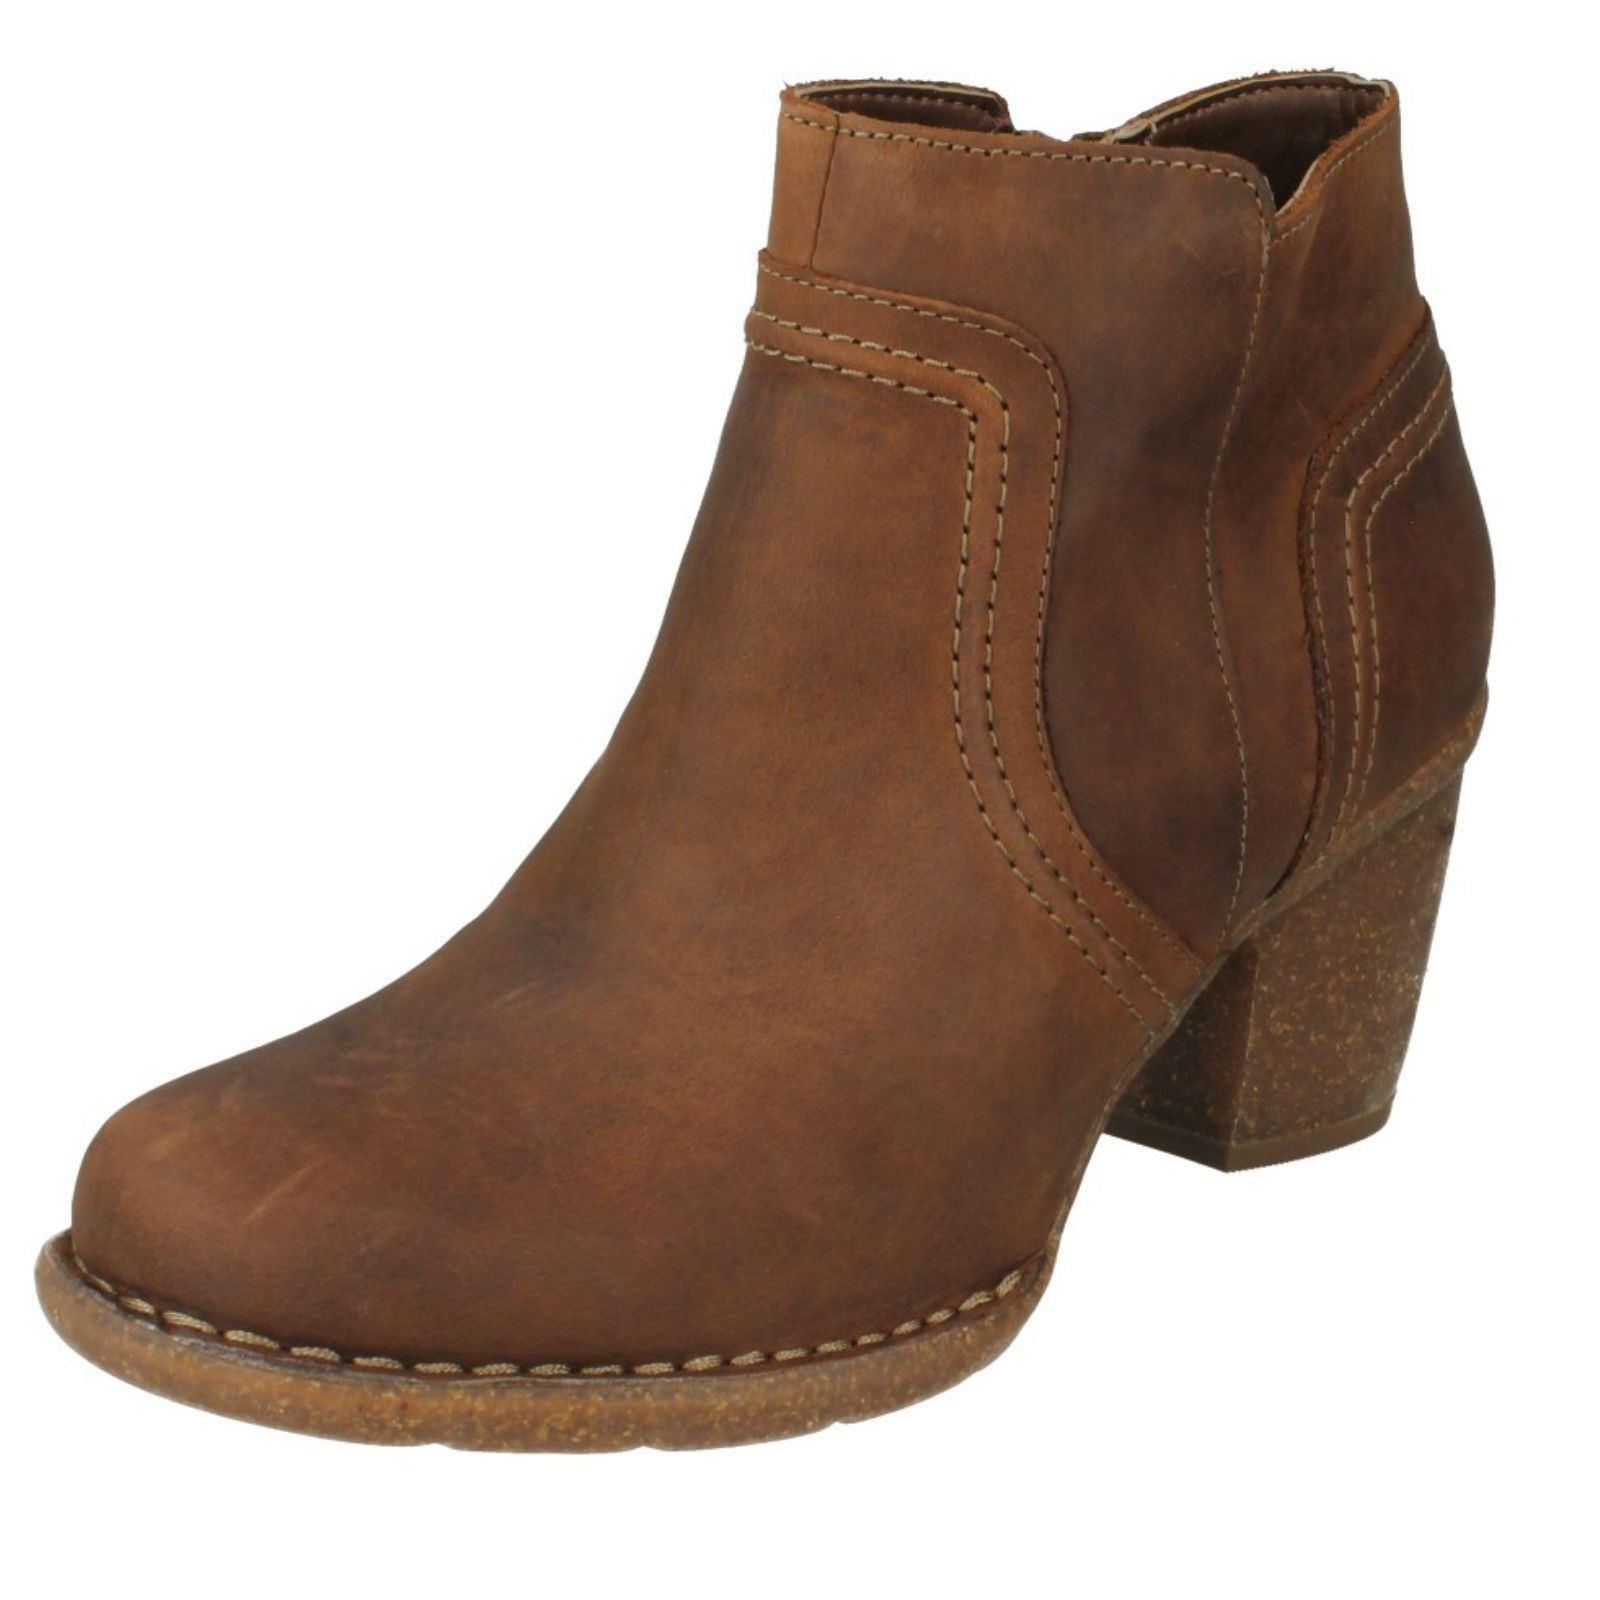 Damas Clarks Grueso botas al Tobillo 'carleta 'carleta Tobillo París's 74a471